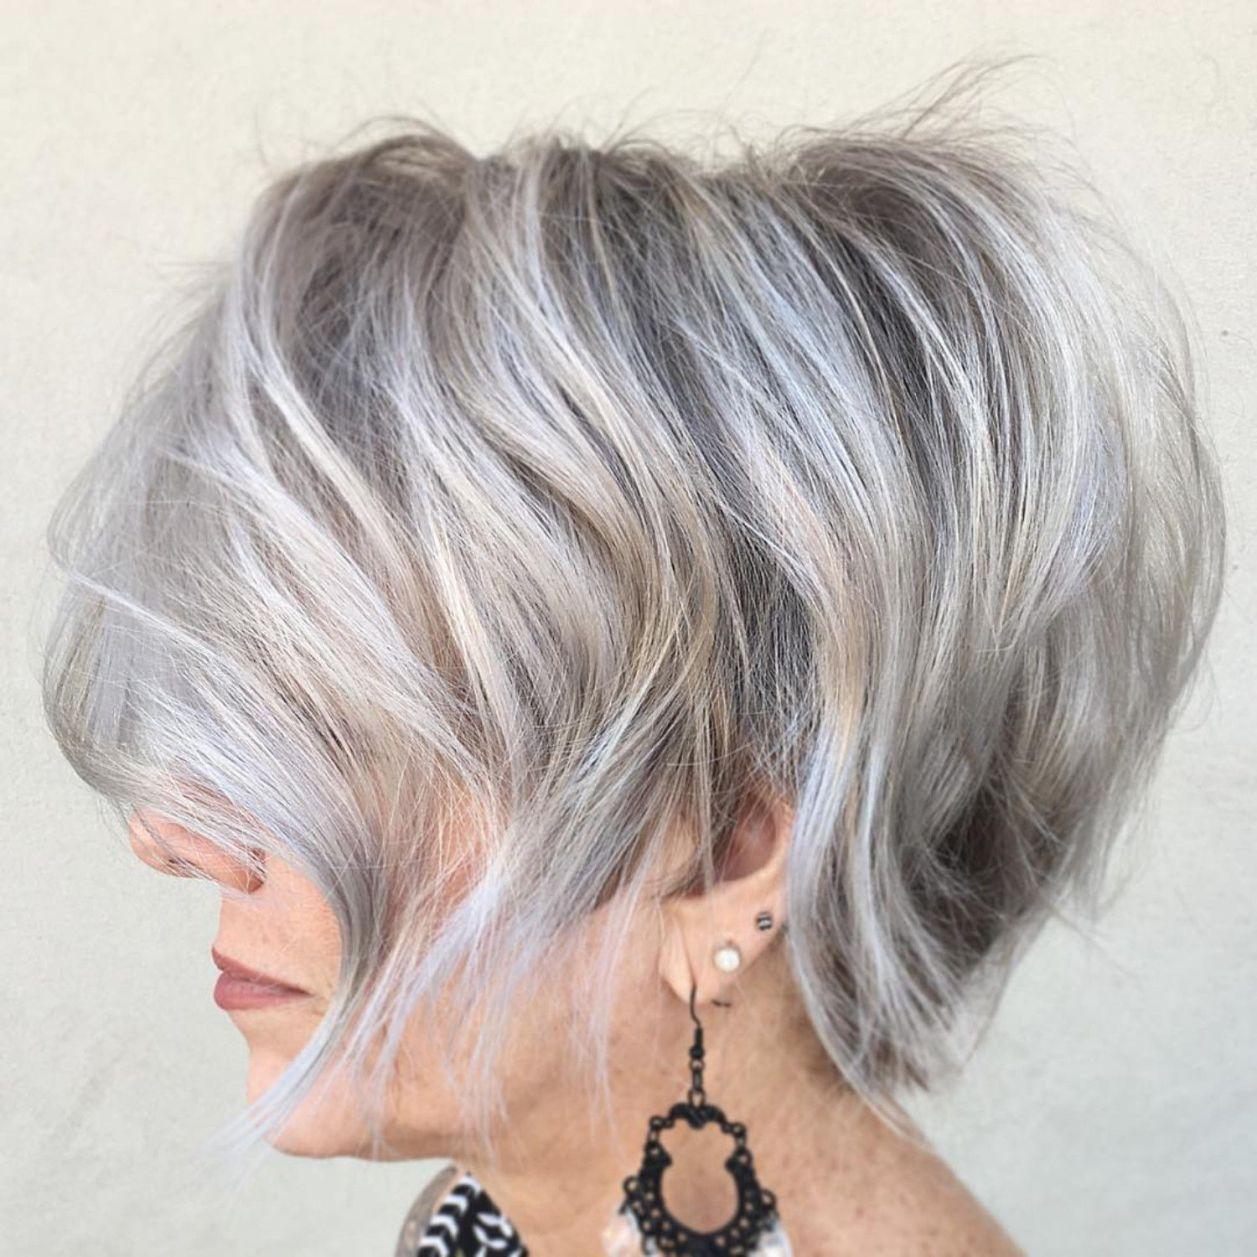 Tousled Gray Balayage Bob 50 Grijs Haar Funky Kort Haar Wit Haar